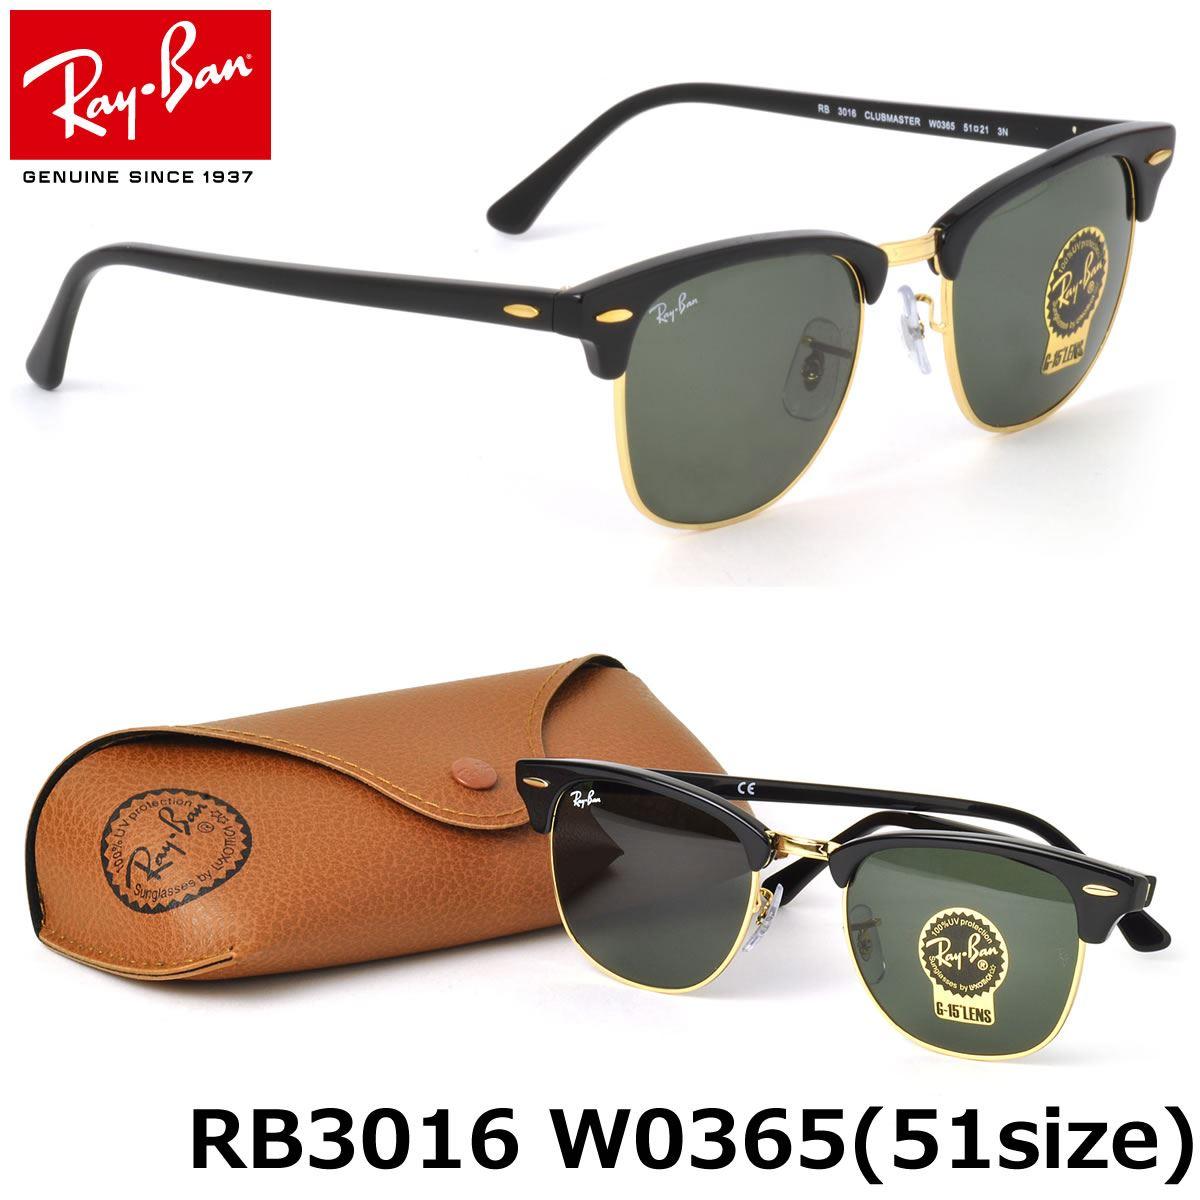 e9afc7b0b3 Lentes De Sol Ray Ban Clubmaster RB3016 W0365 Clasico 51mm